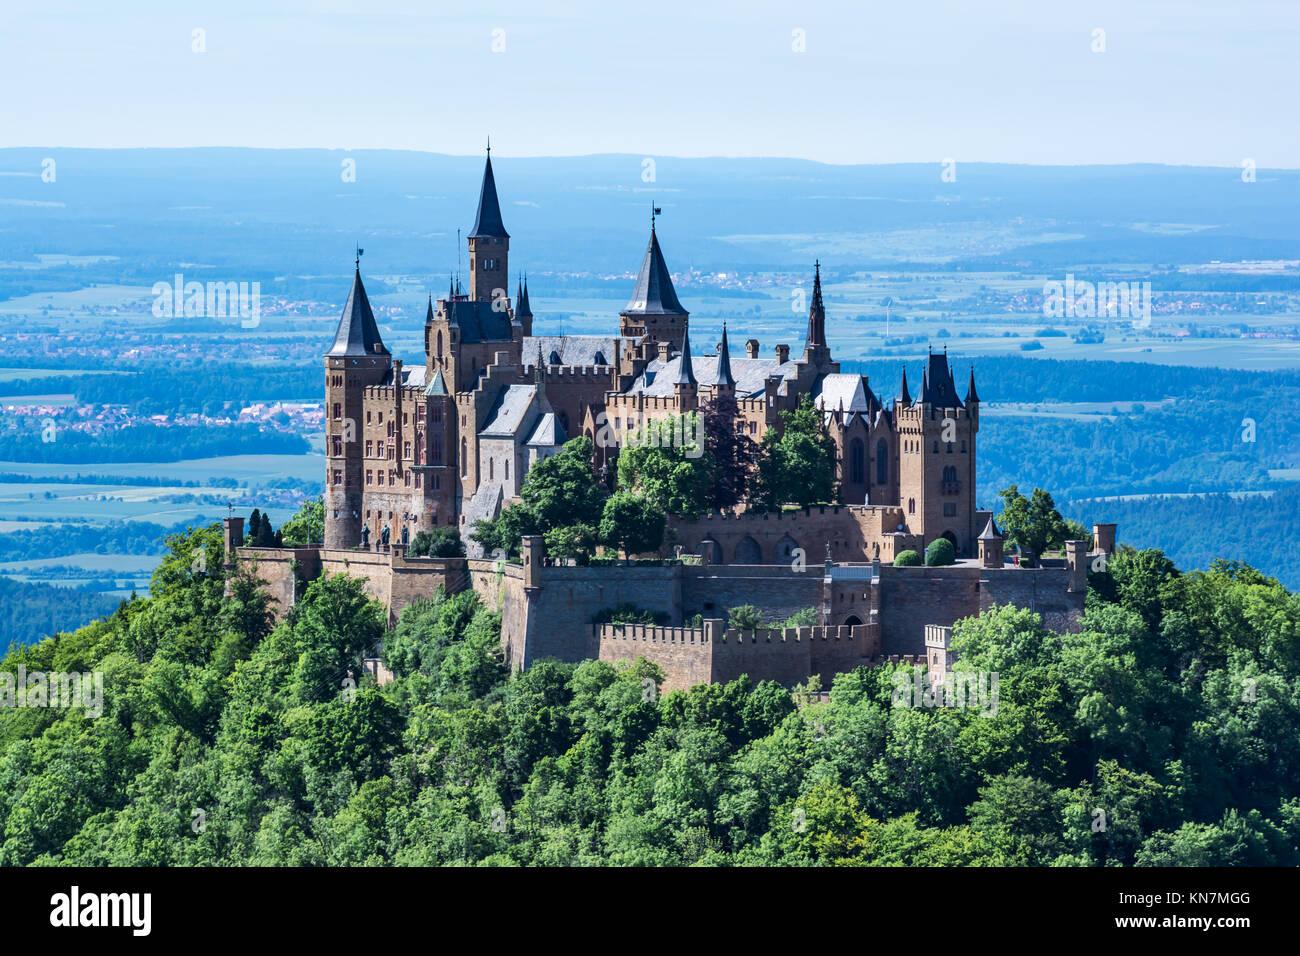 Burg Hohenzollern German European Castle Architecture Travel Famous Stock Photo Alamy